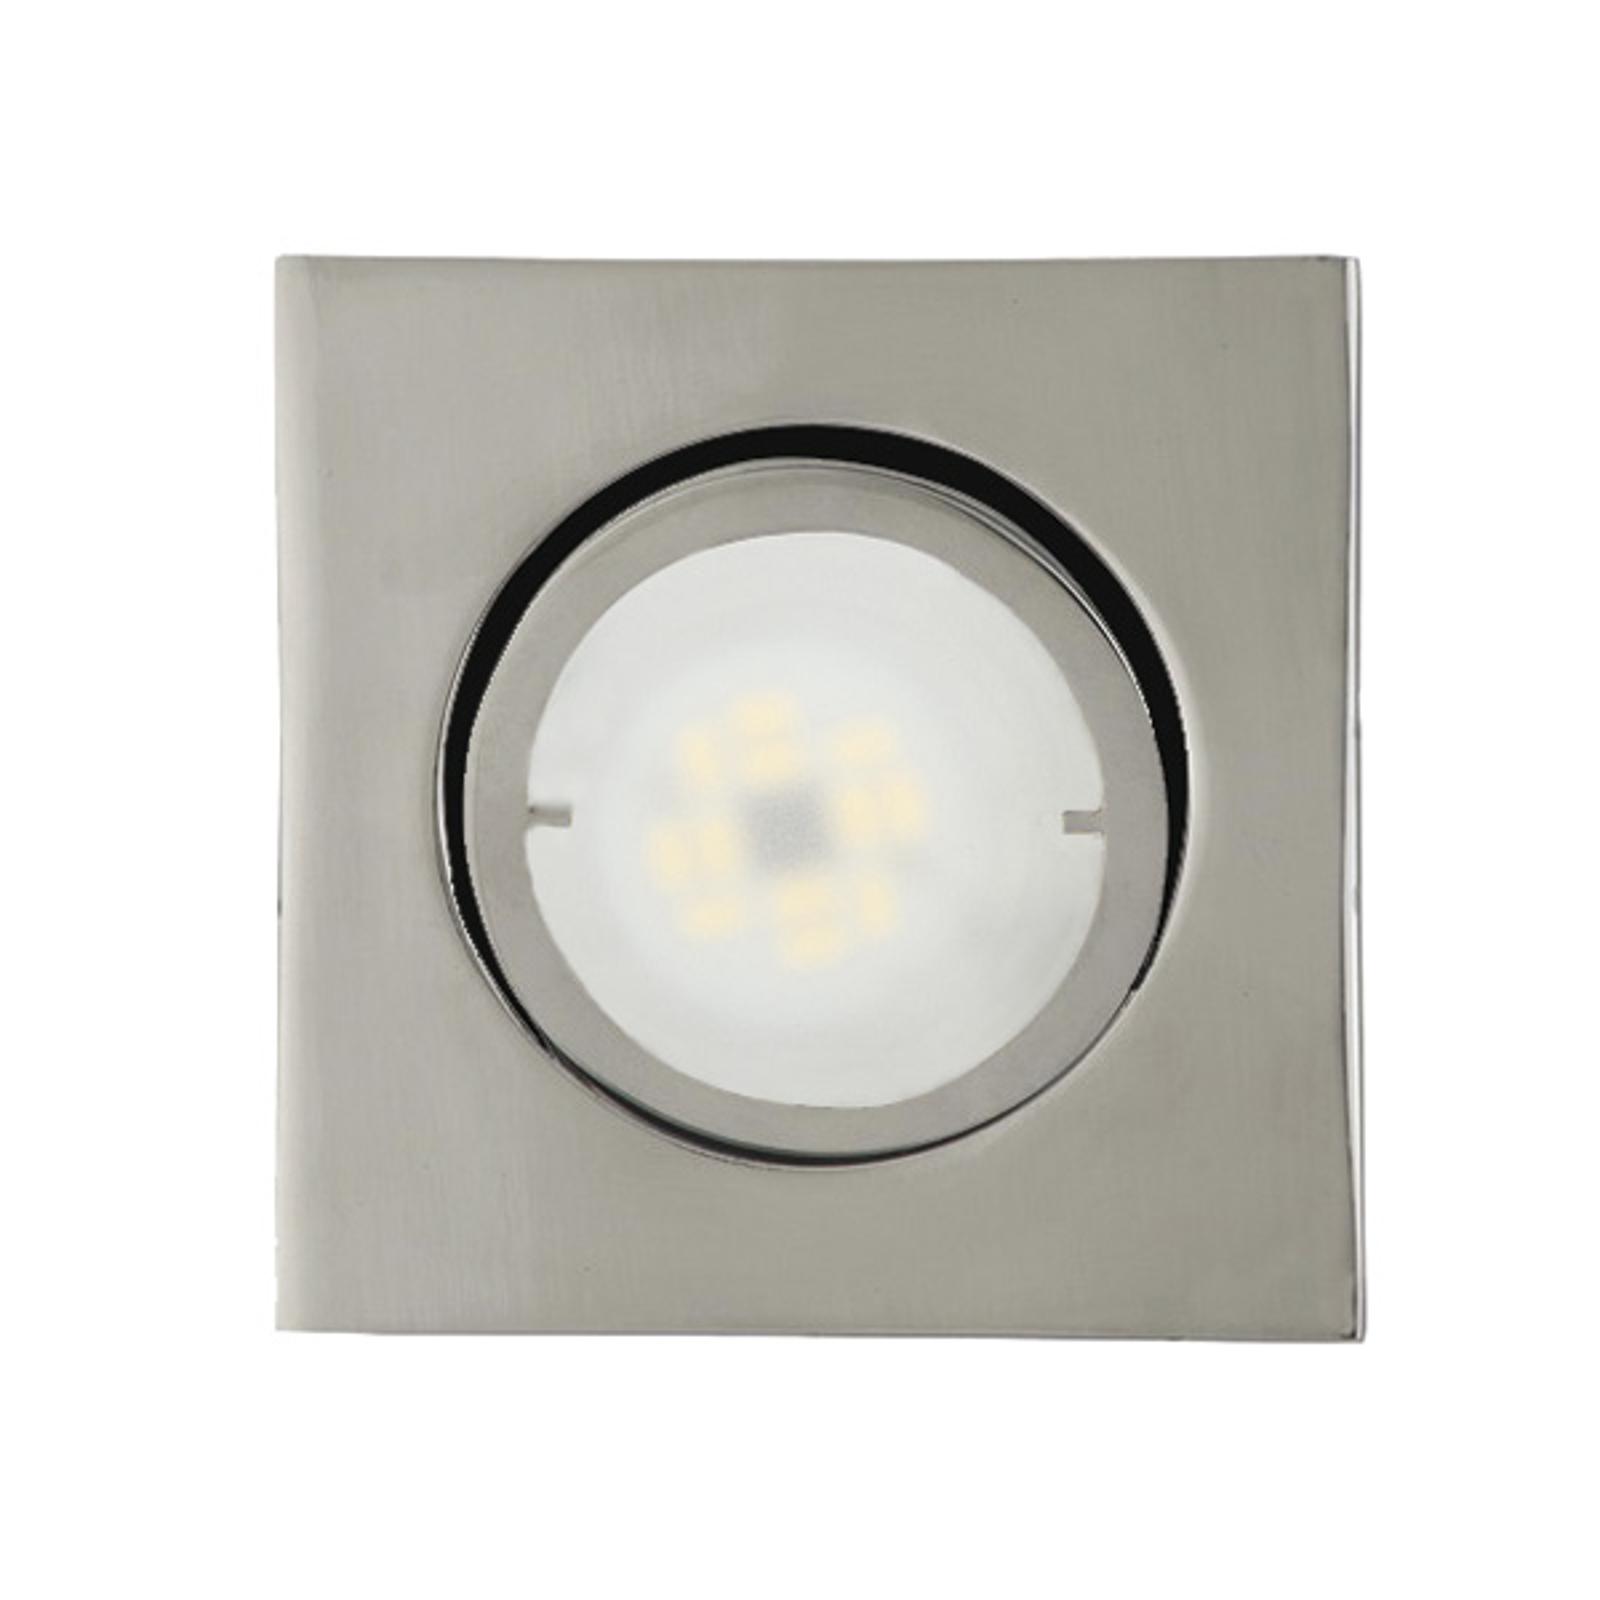 Square LED recessed light Joanie, chrome_1524119_1